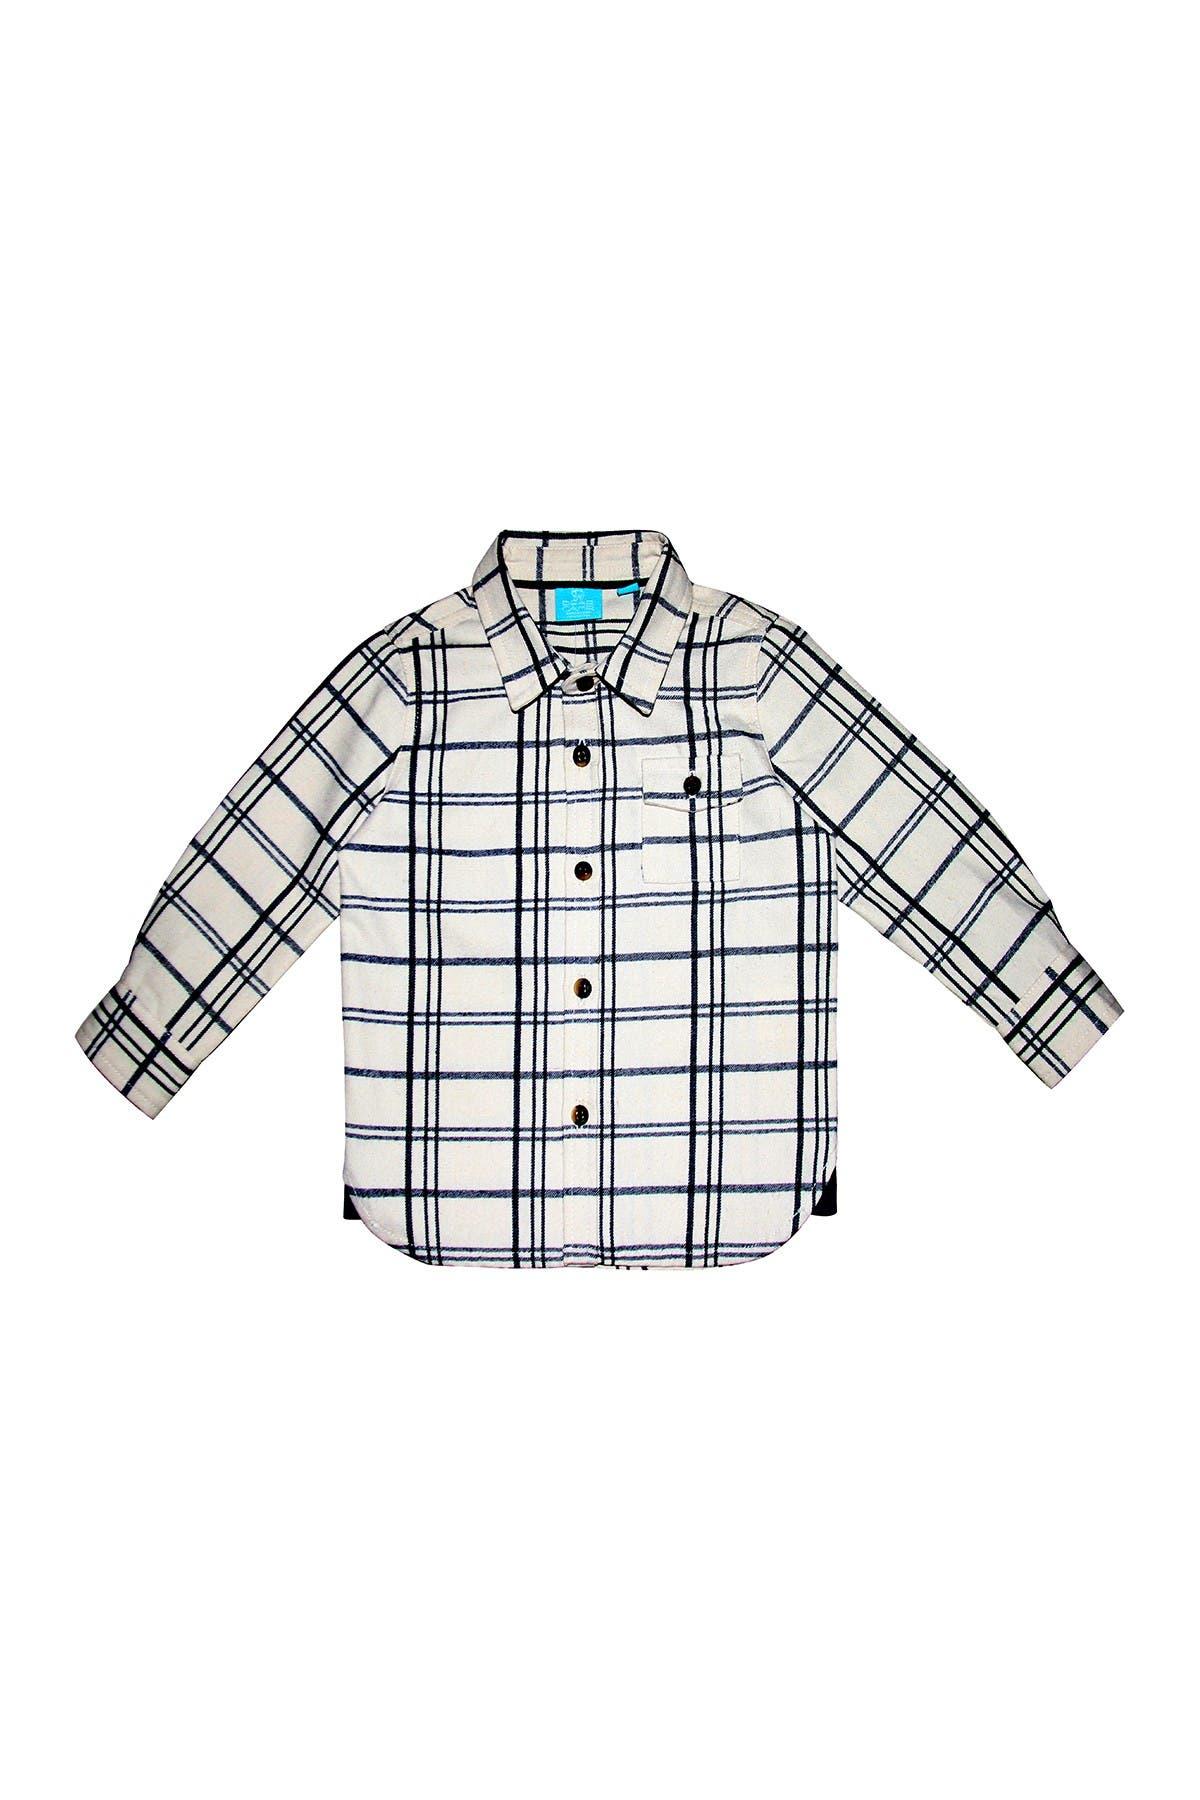 Image of BEAR CAMP Plaid Flannel Pocket Shirt